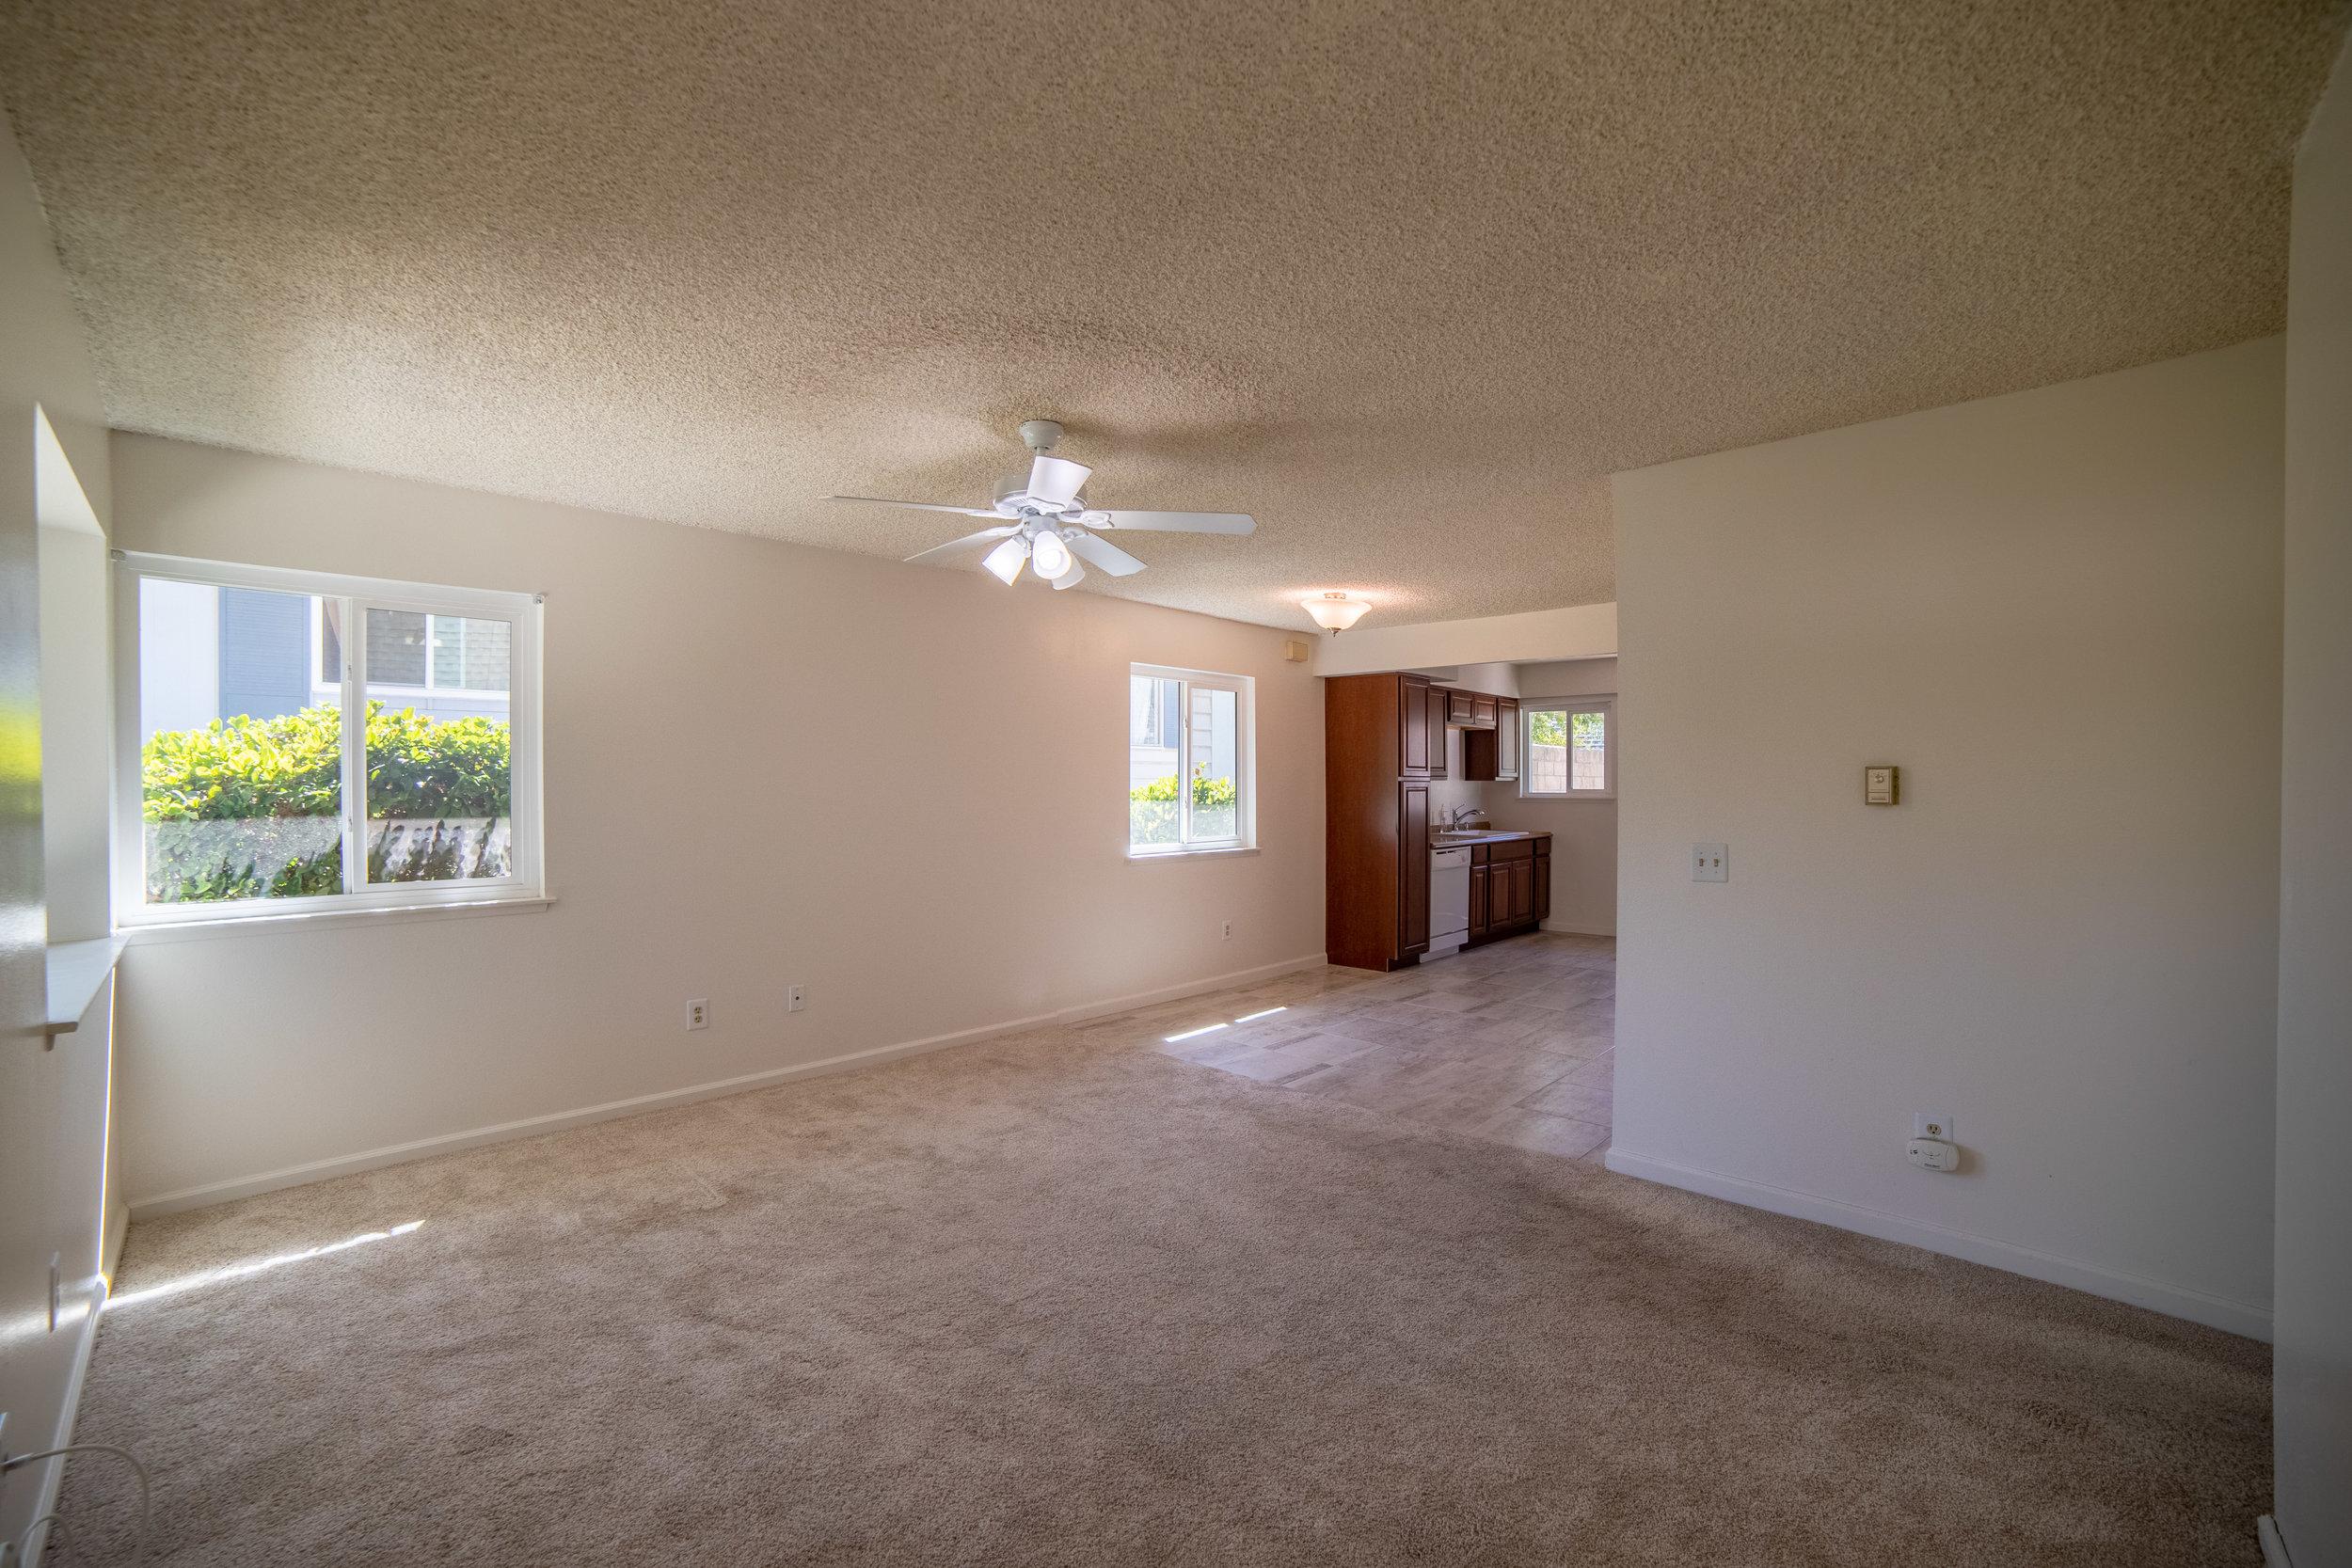 2104 - Nathaniel Pitchon-Getzels - 10210 Oklahoma Ave-4.jpg